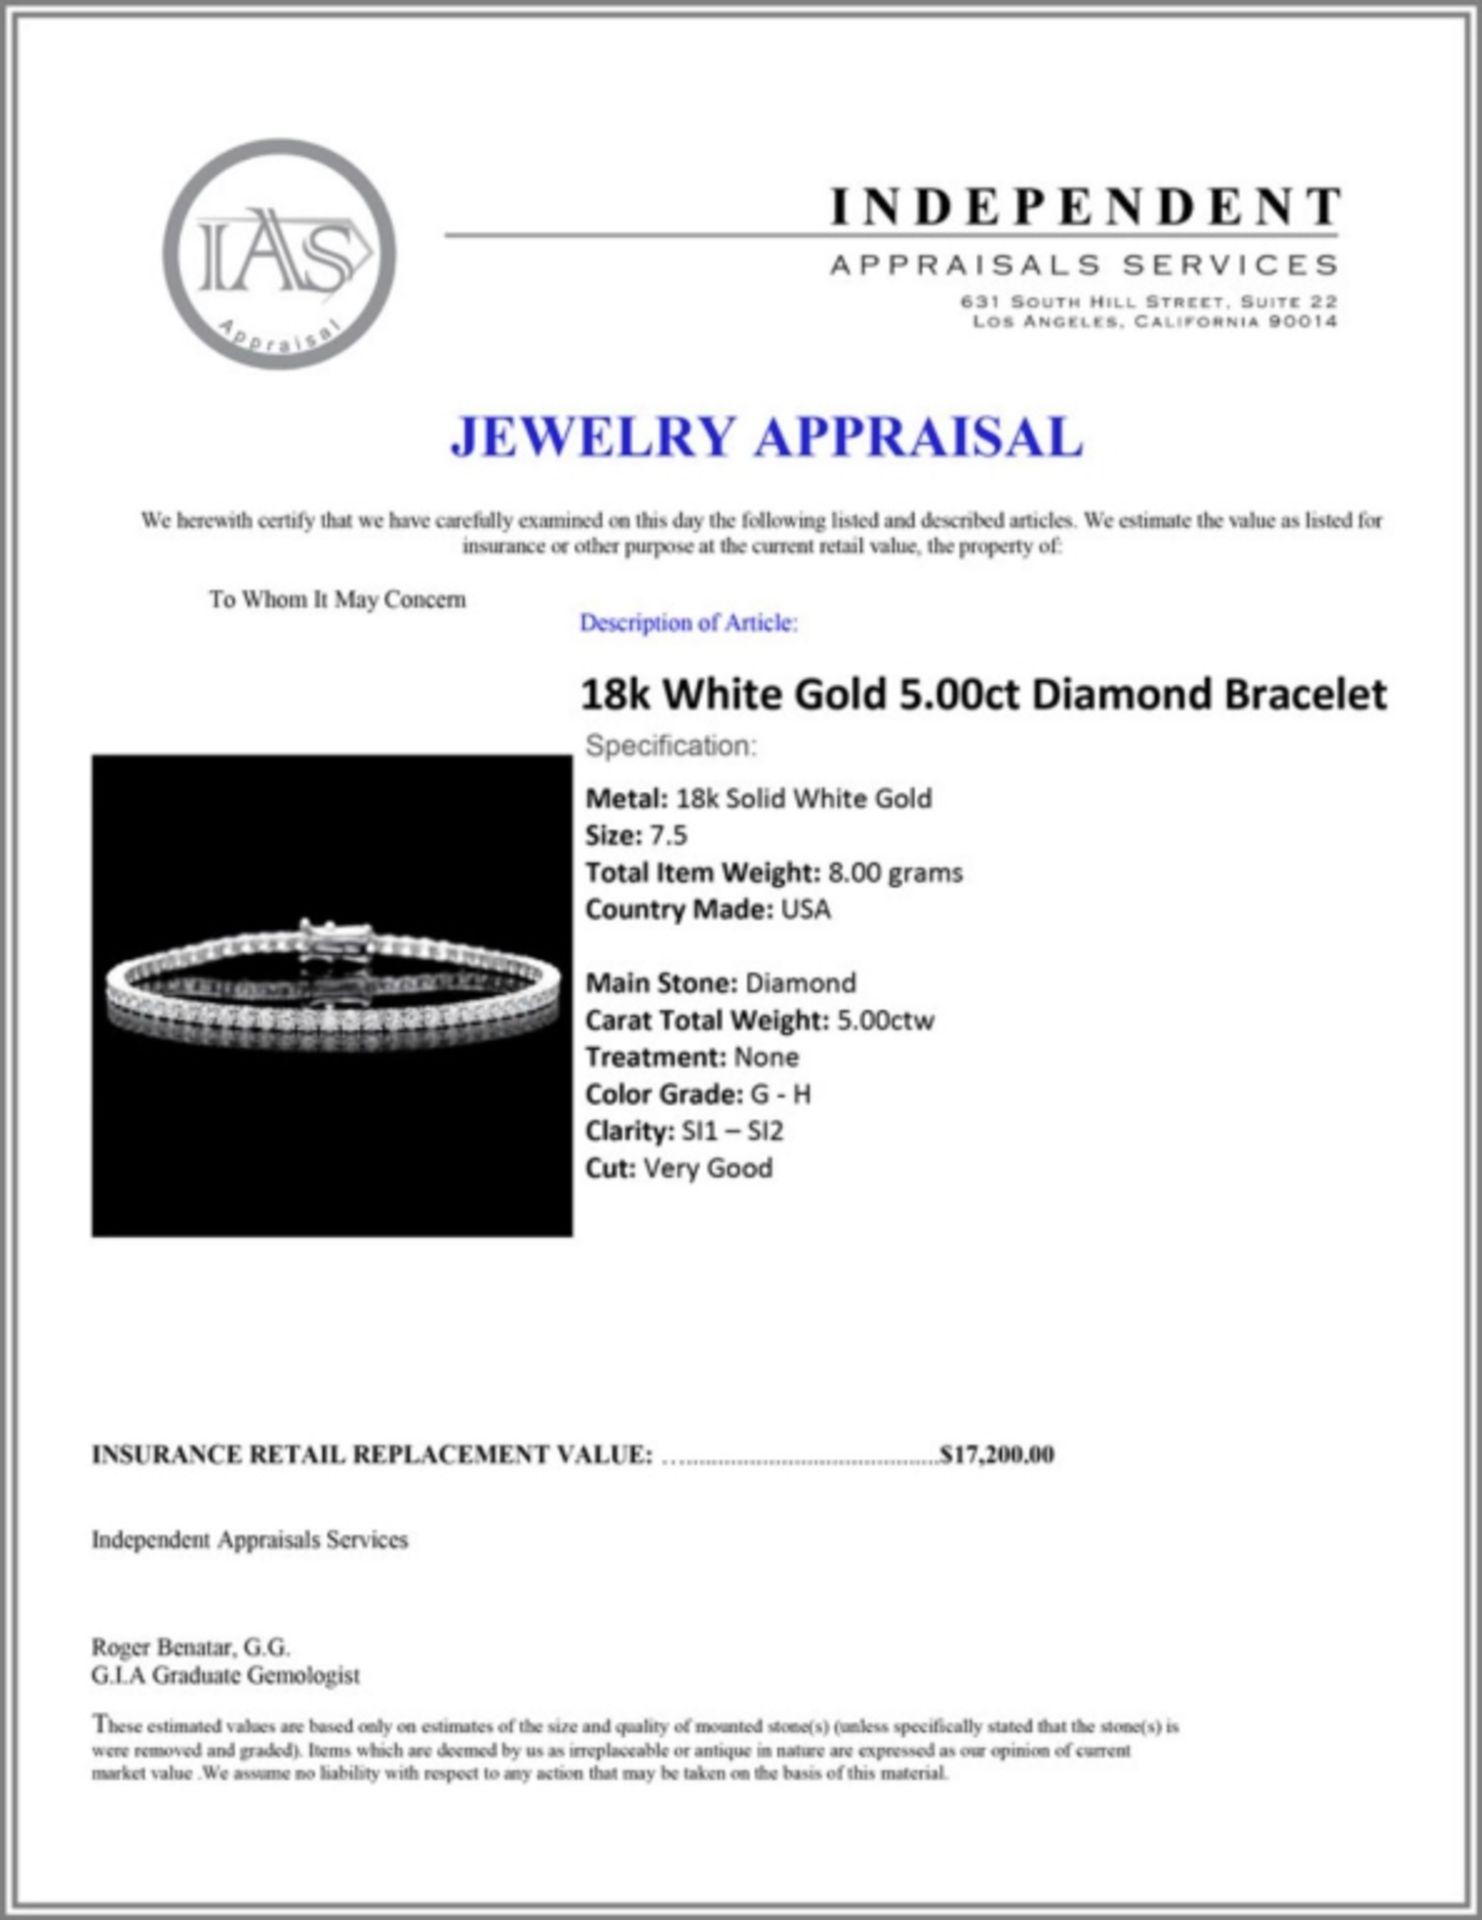 ^18k White Gold 5.00ct Diamond Bracelet - Image 4 of 4